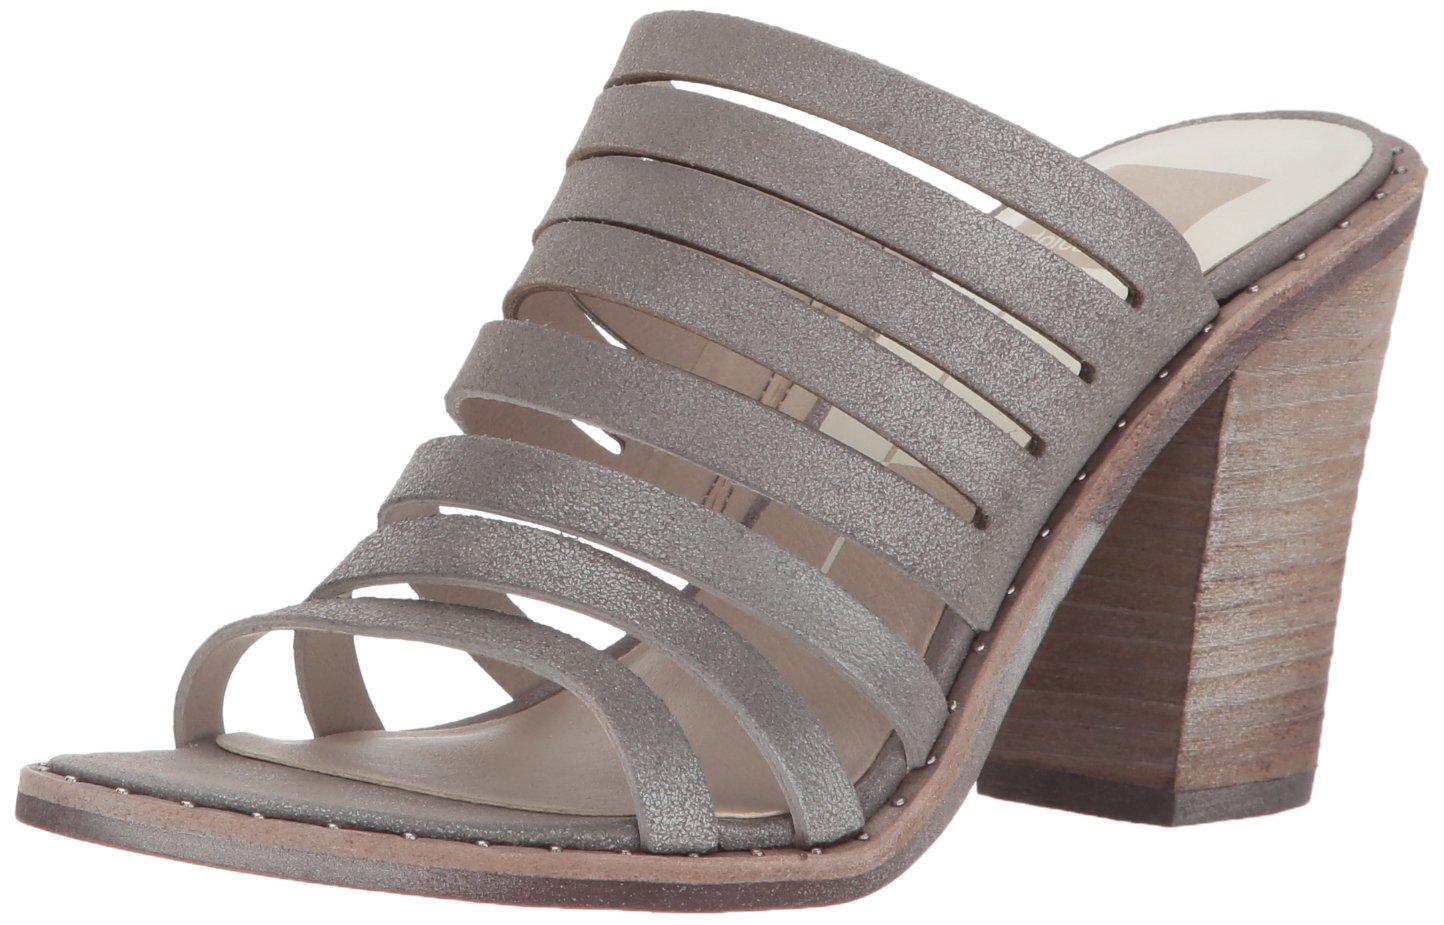 Dolce Vita Women's Lorna Heeled Sandal, Smoke Suede, 8 M US